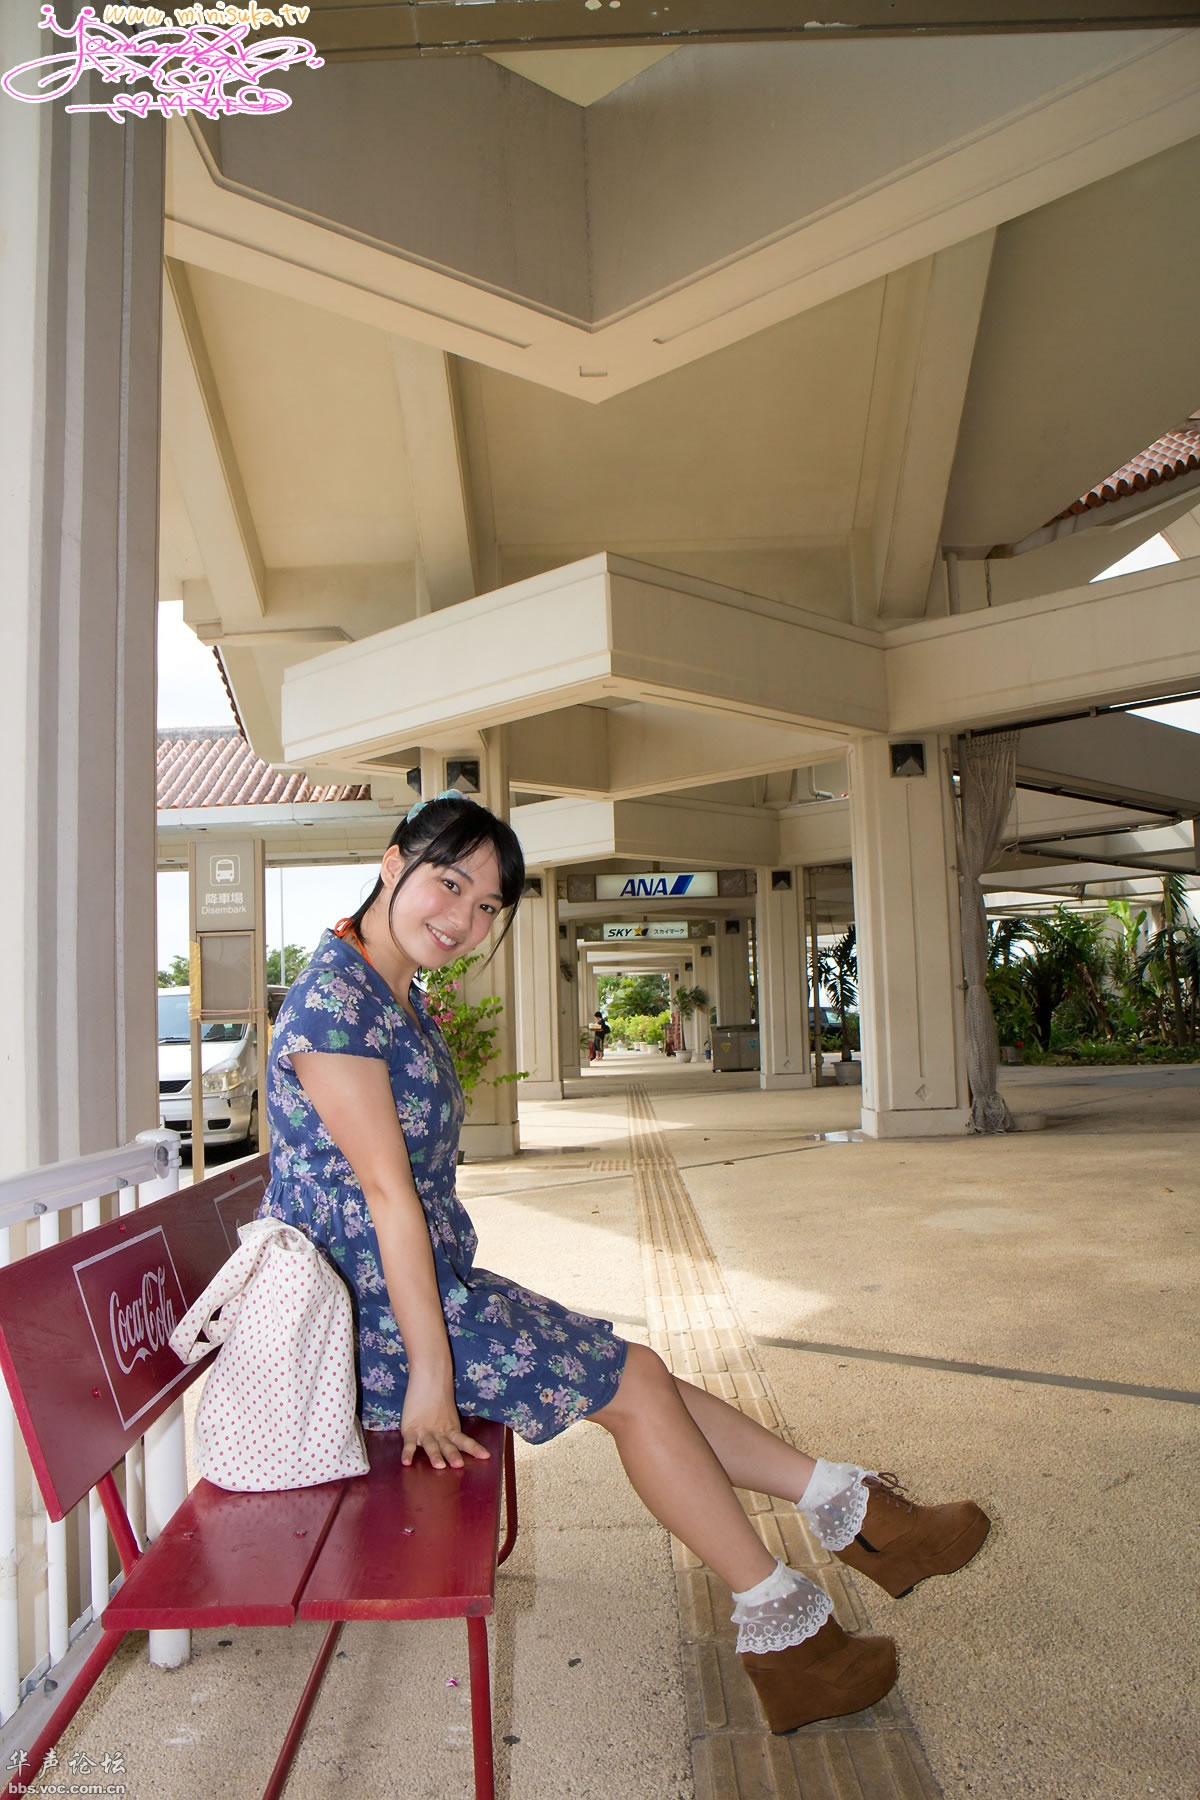 Tomoe Yamanaka 山中知恵 Gallery One | Minisuka.tv 2014.01.16